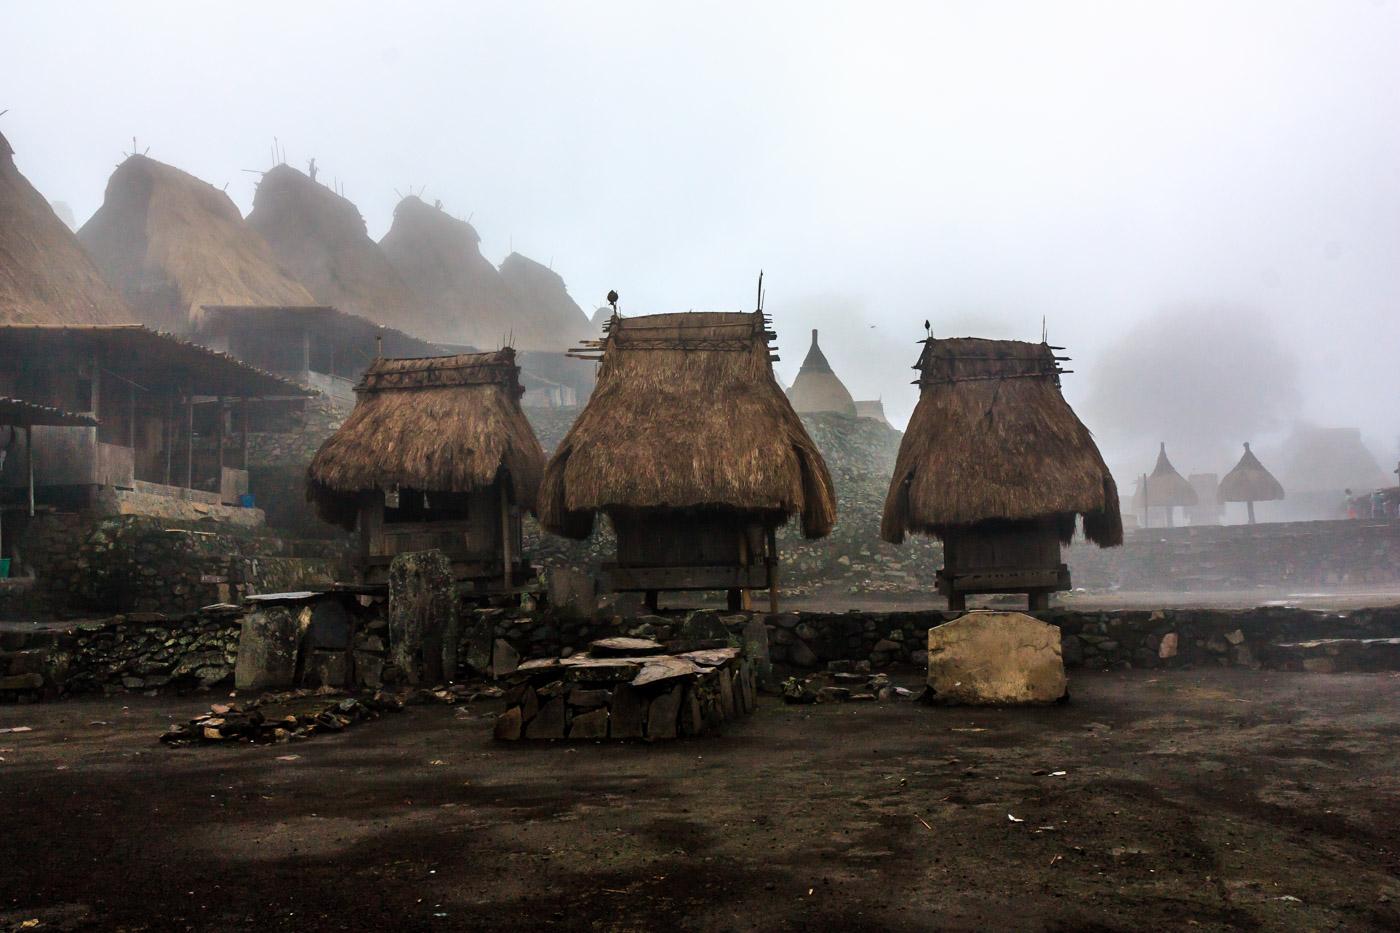 Bhaga in the mist.